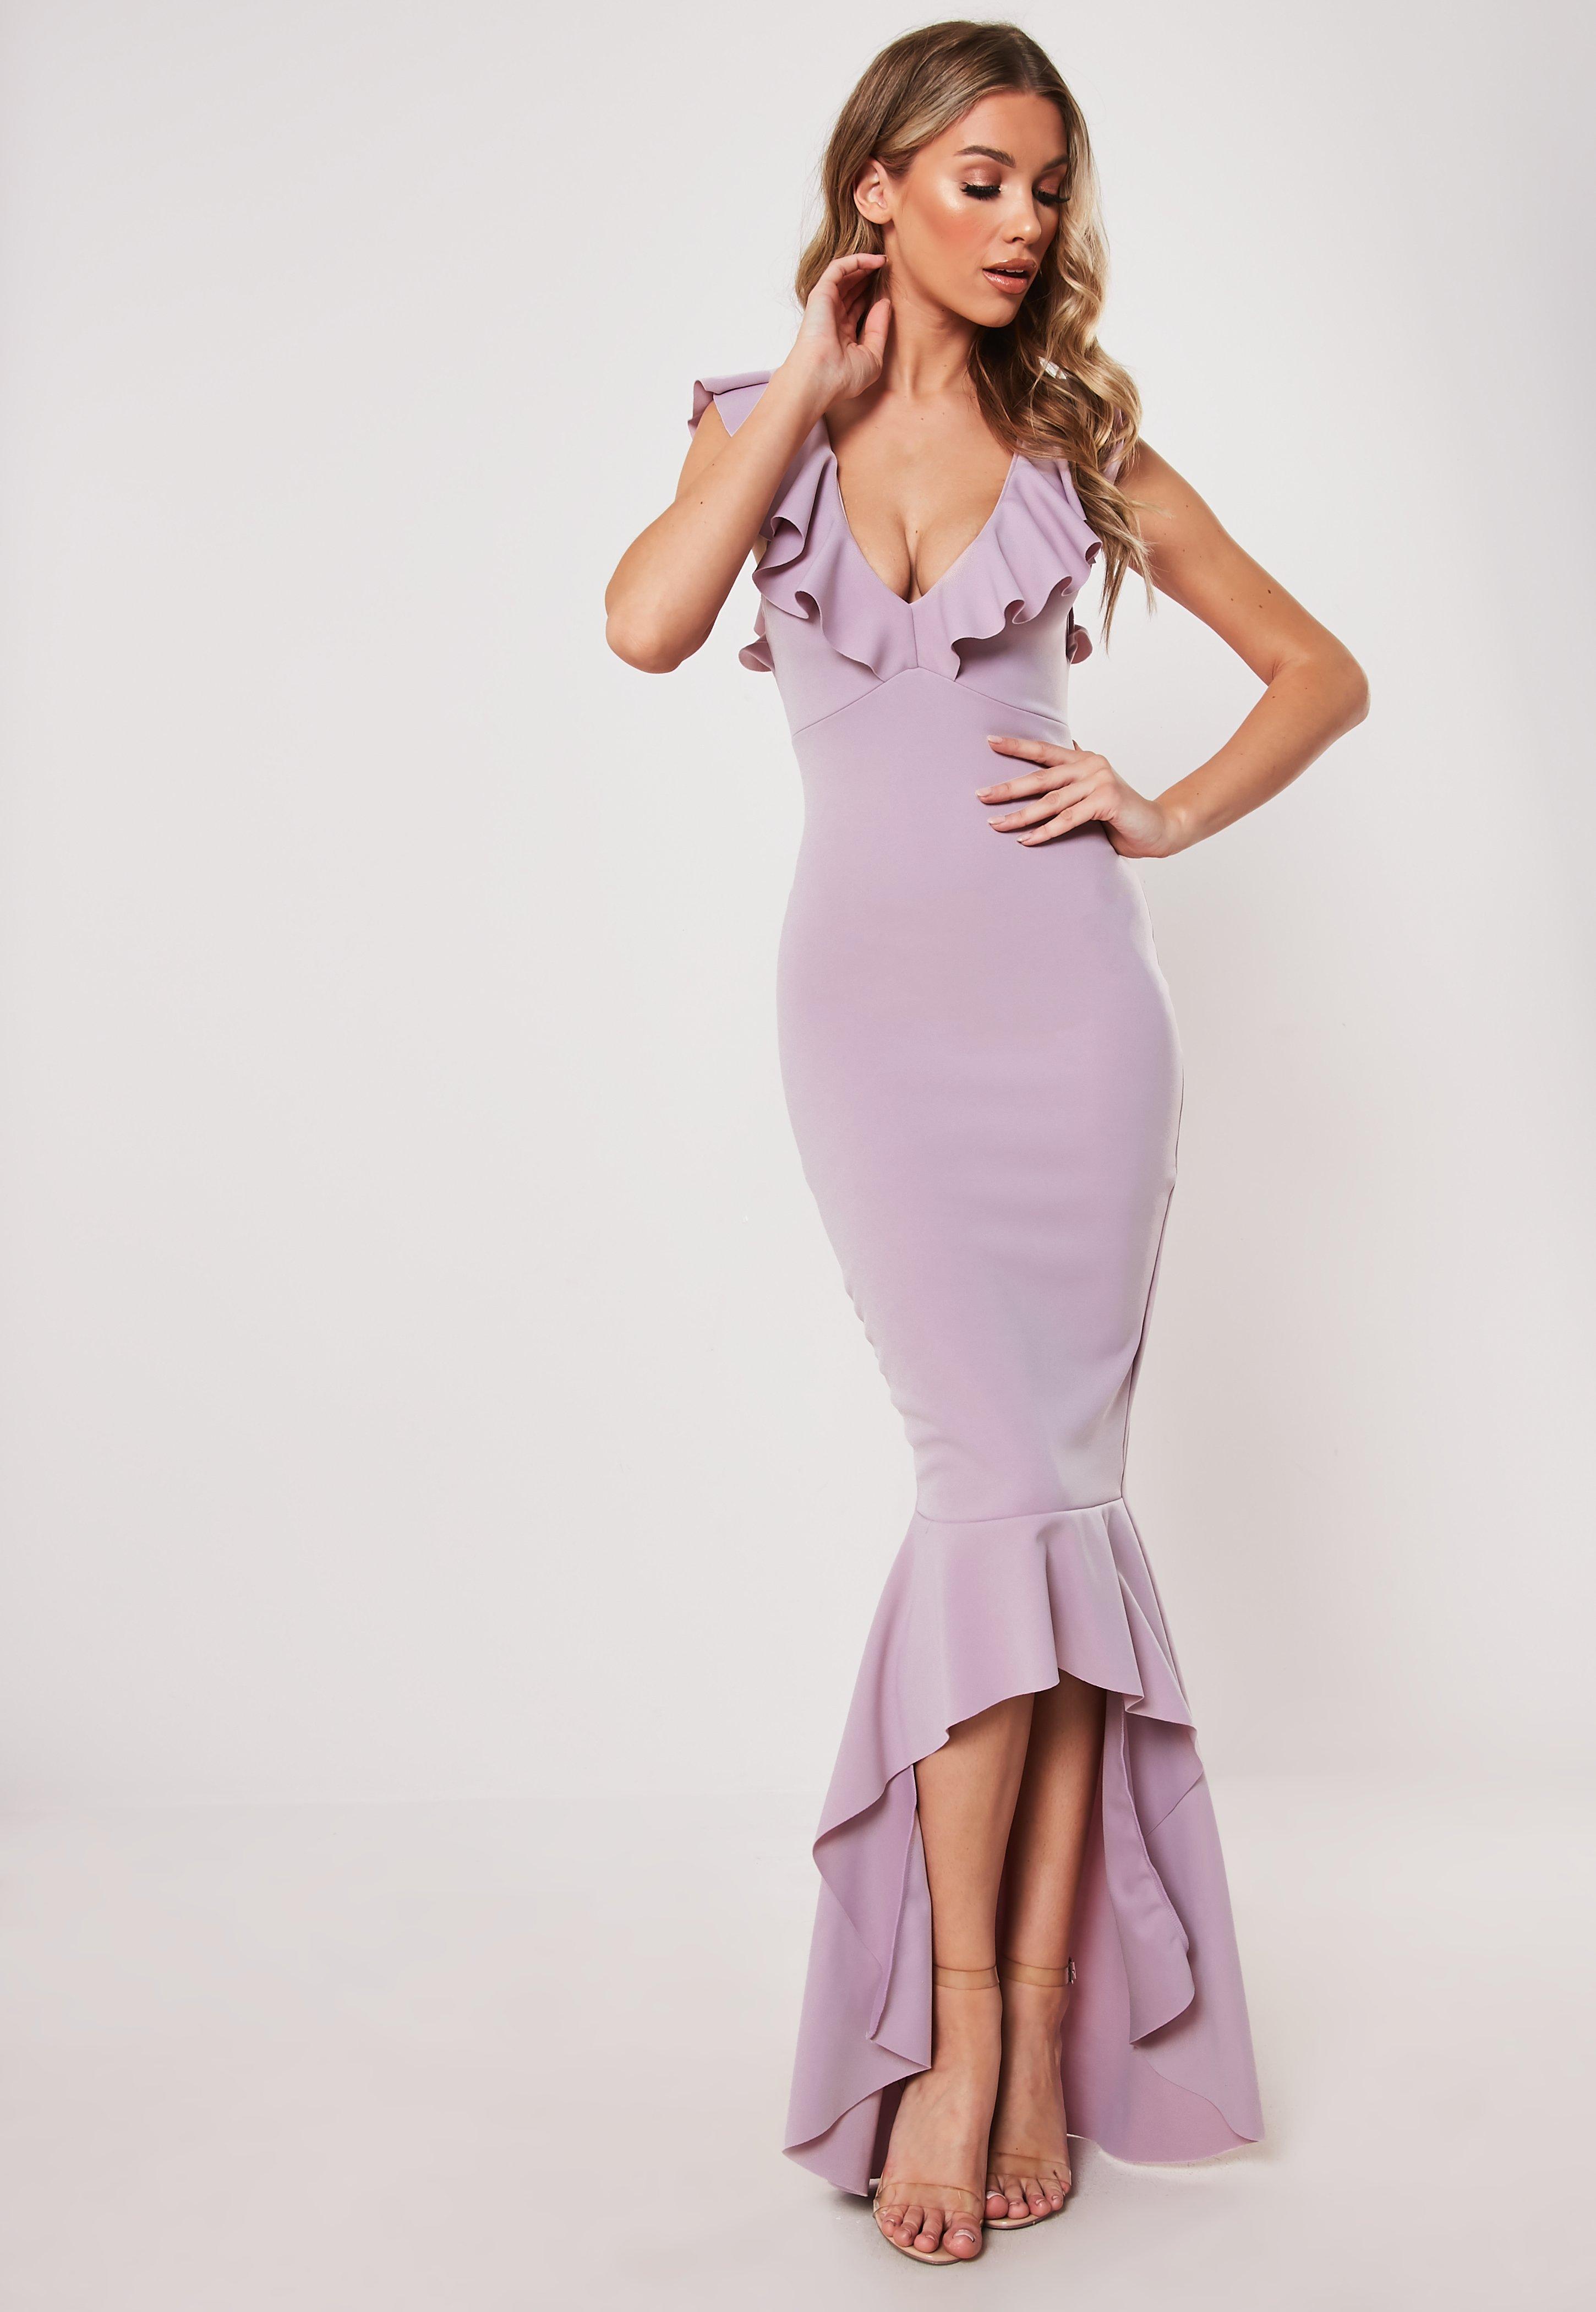 851f720f0ee Bodycon Dresses